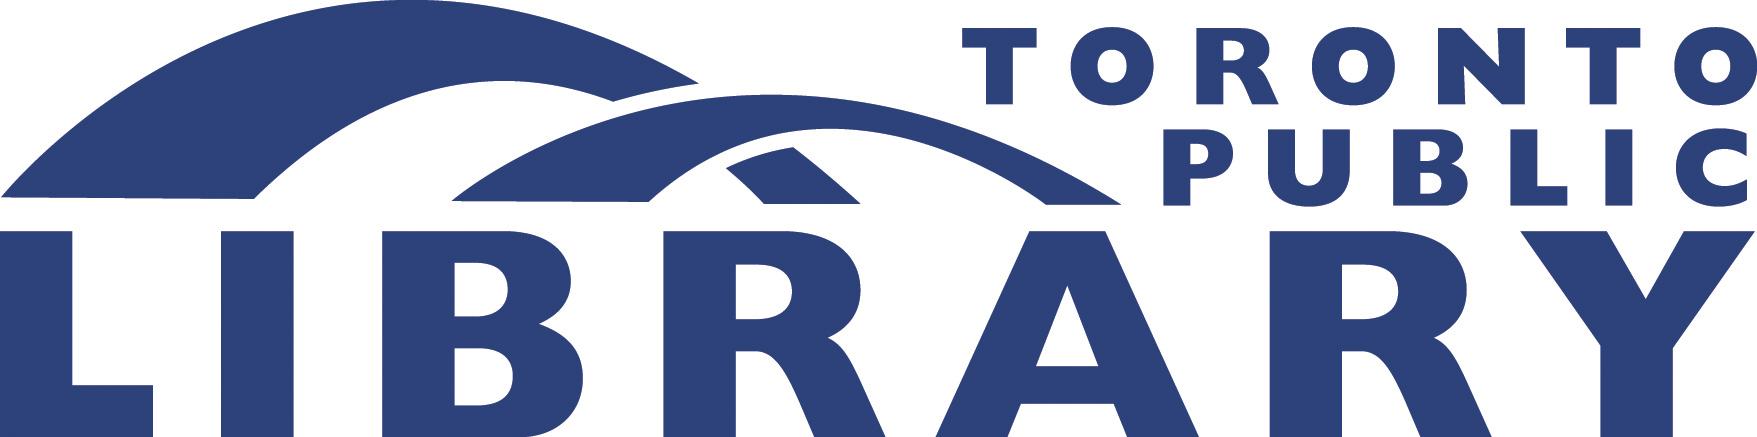 TPL logo rgb.jpg